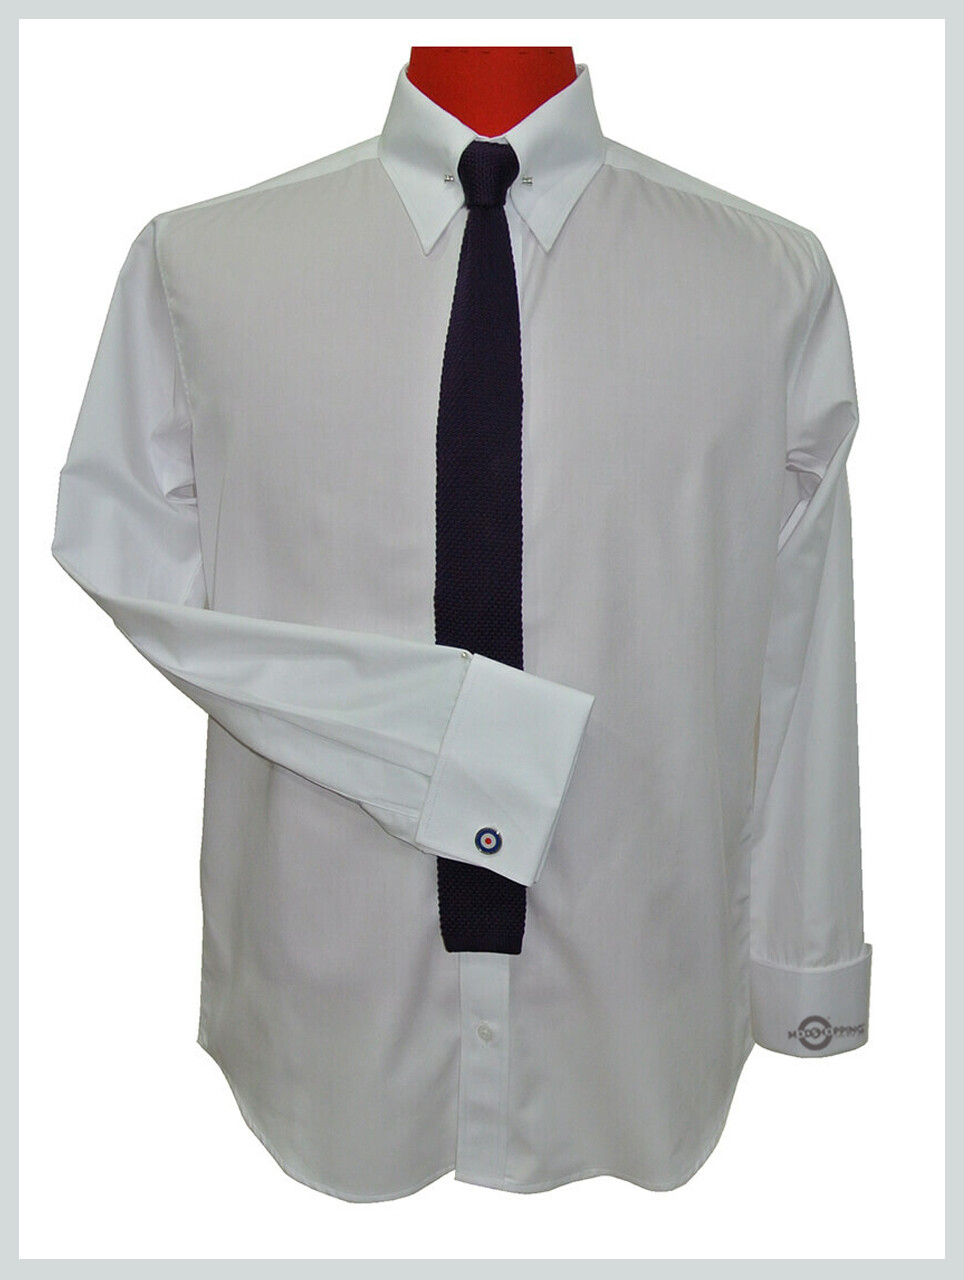 High Collar Shirt| High Collar Pin White Shirt For Men